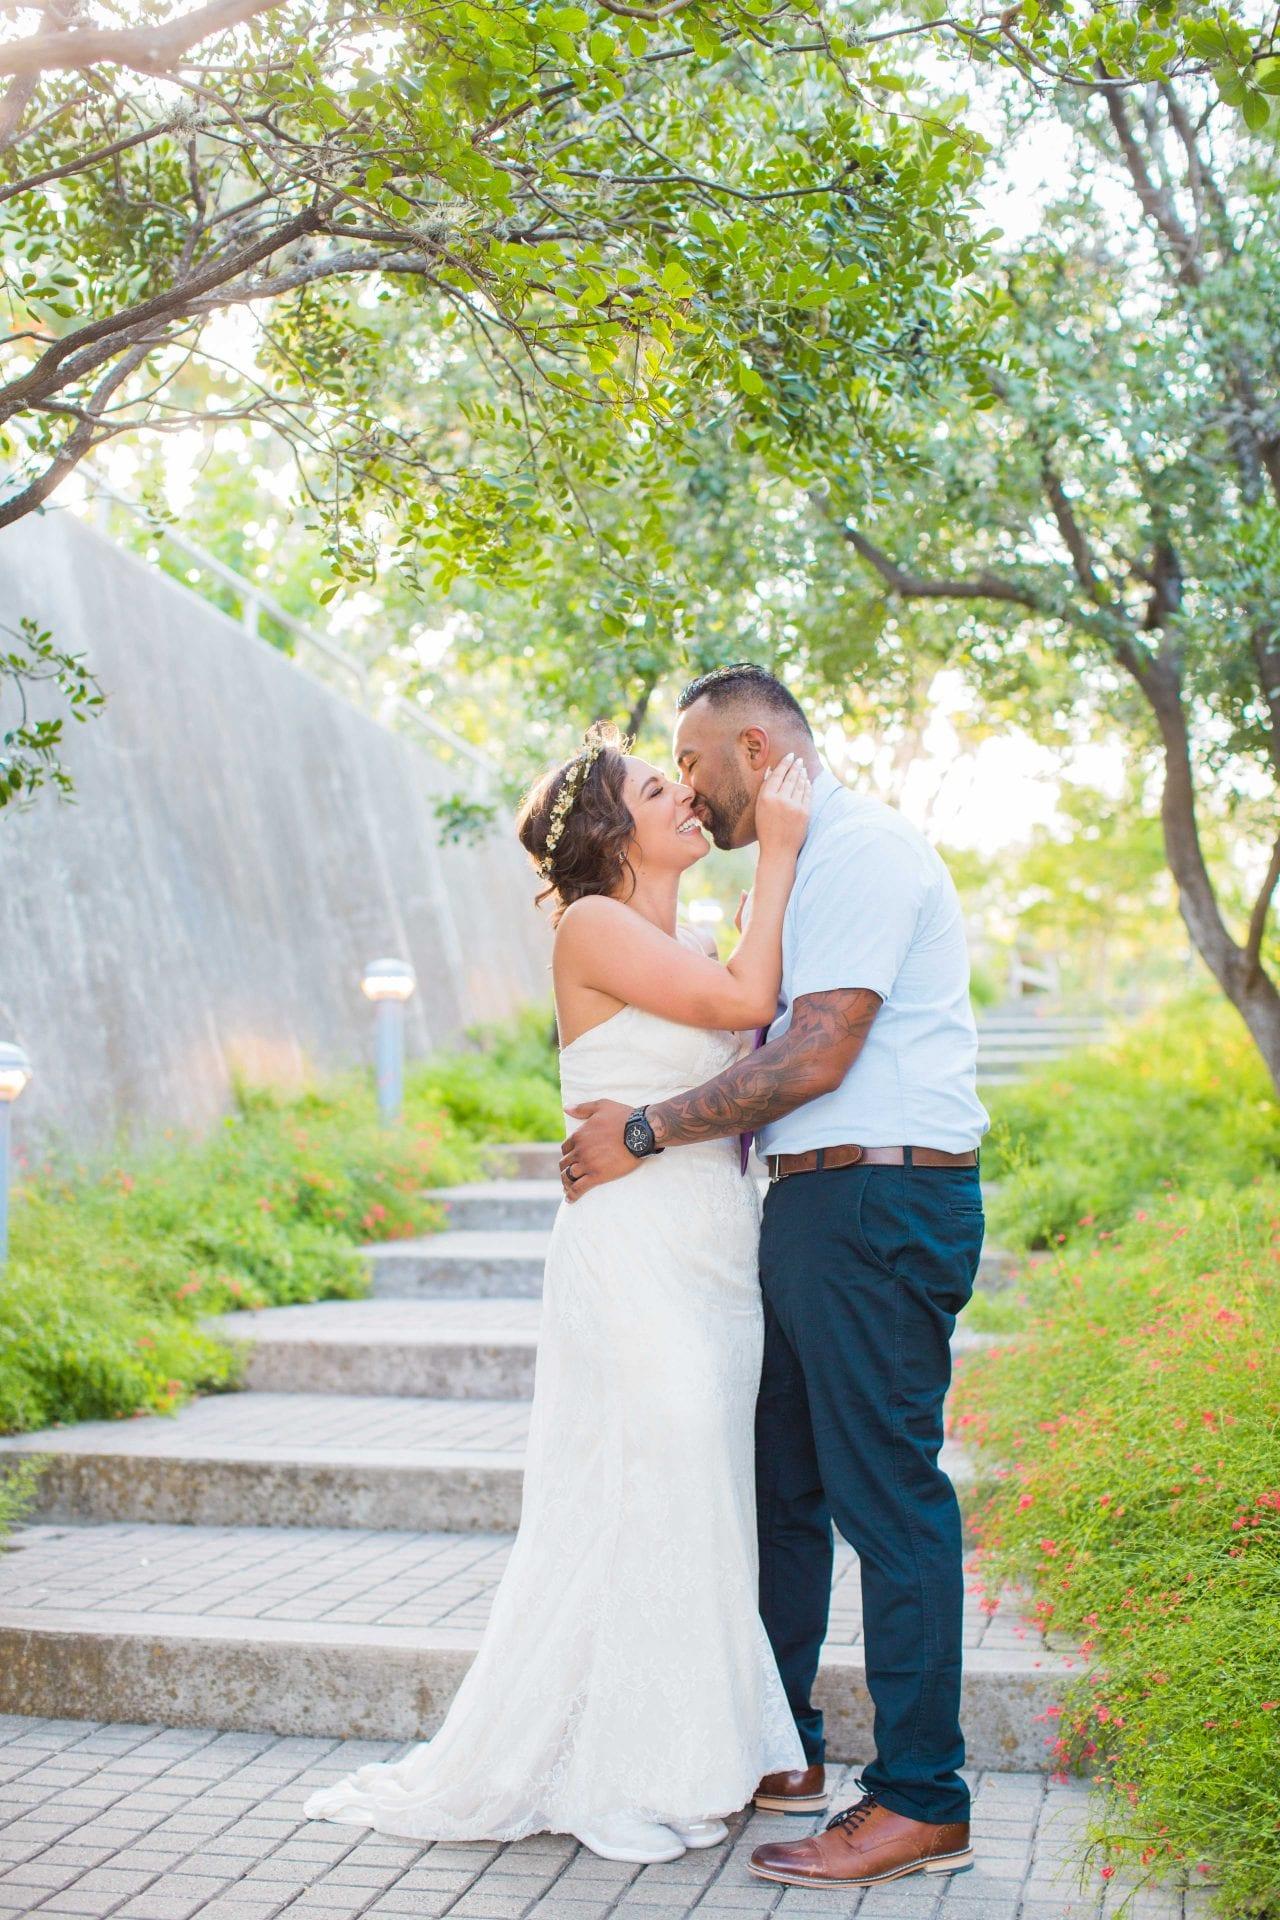 Courtney Amaya wedding San Antonio Botanical Garden couple on the stairs kissing